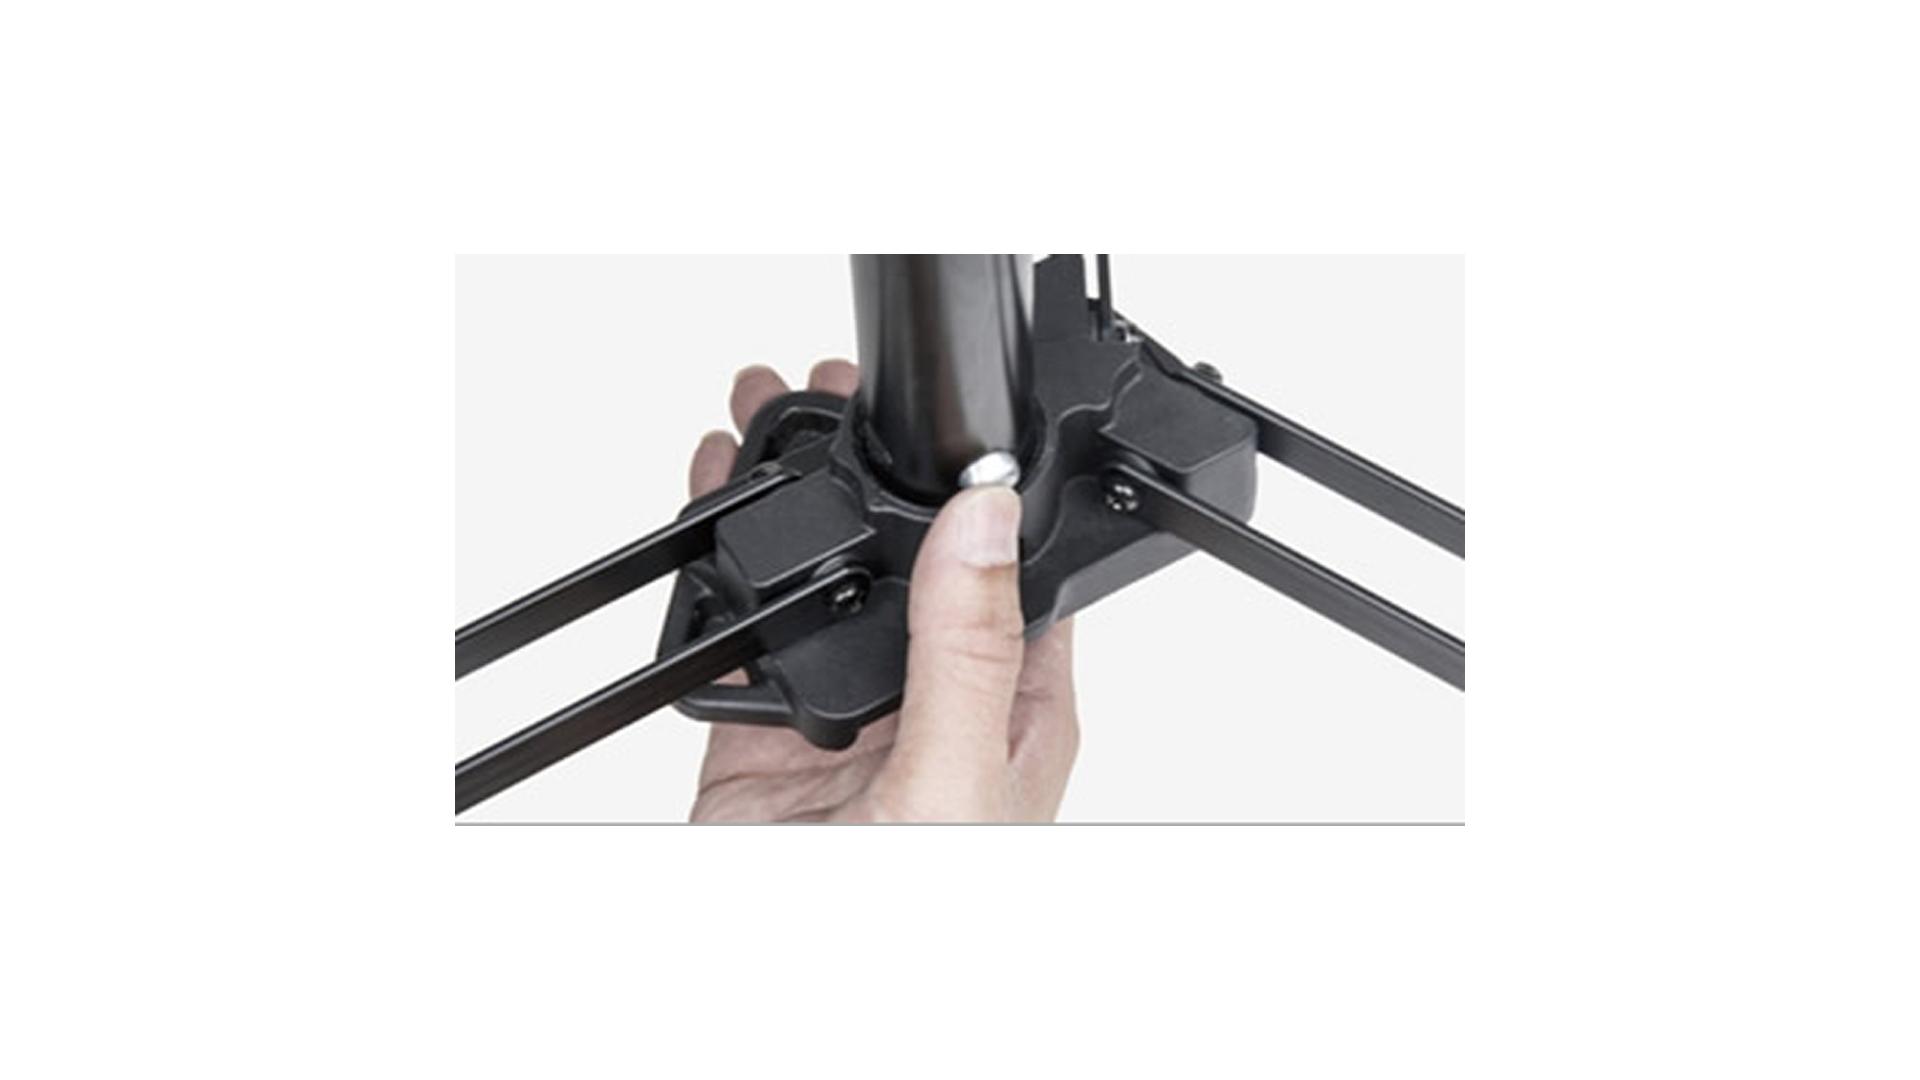 Kupo Swit | Bundle kit luce LED SWIT CL 120D + stativo Kupo 121 + Batteria V lock SWIT S 8113S | Non categorizzato